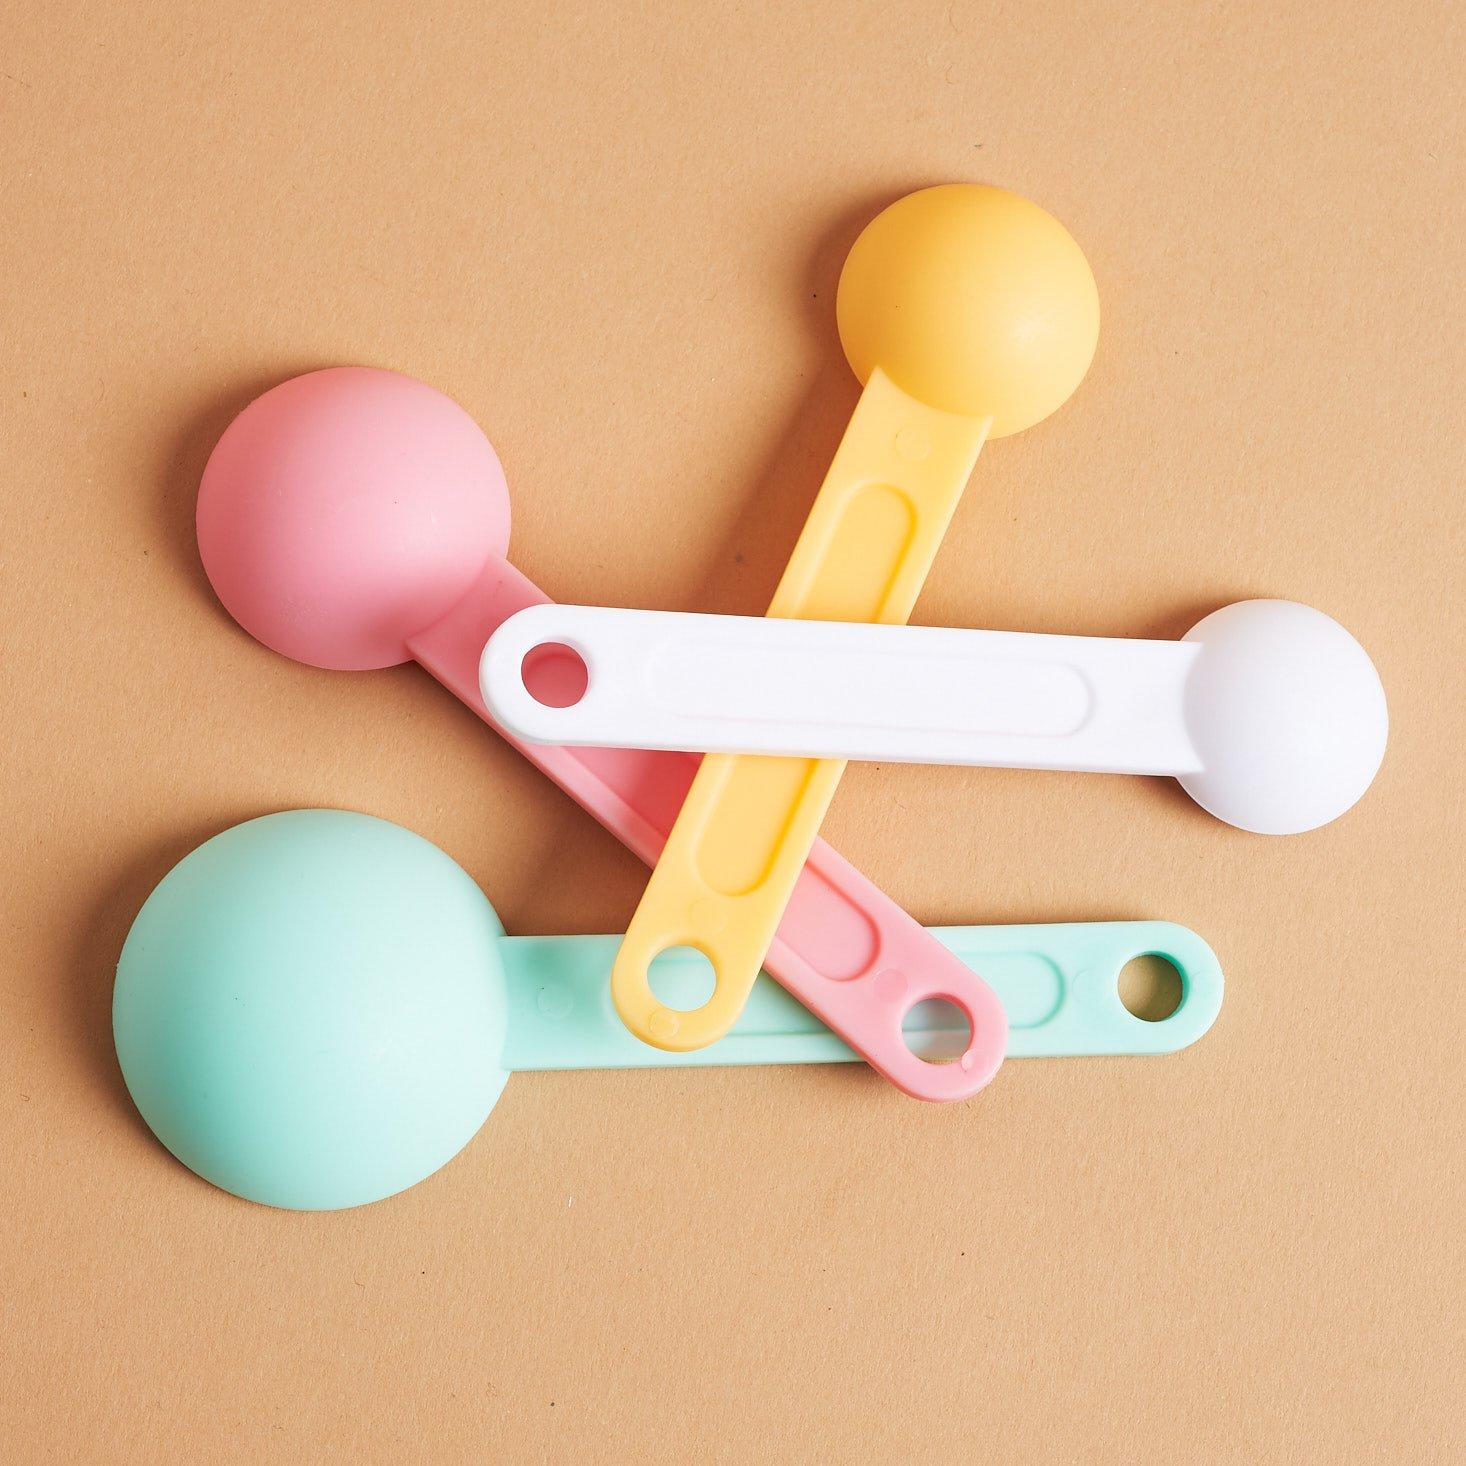 back of Pusheen Measuring spoons